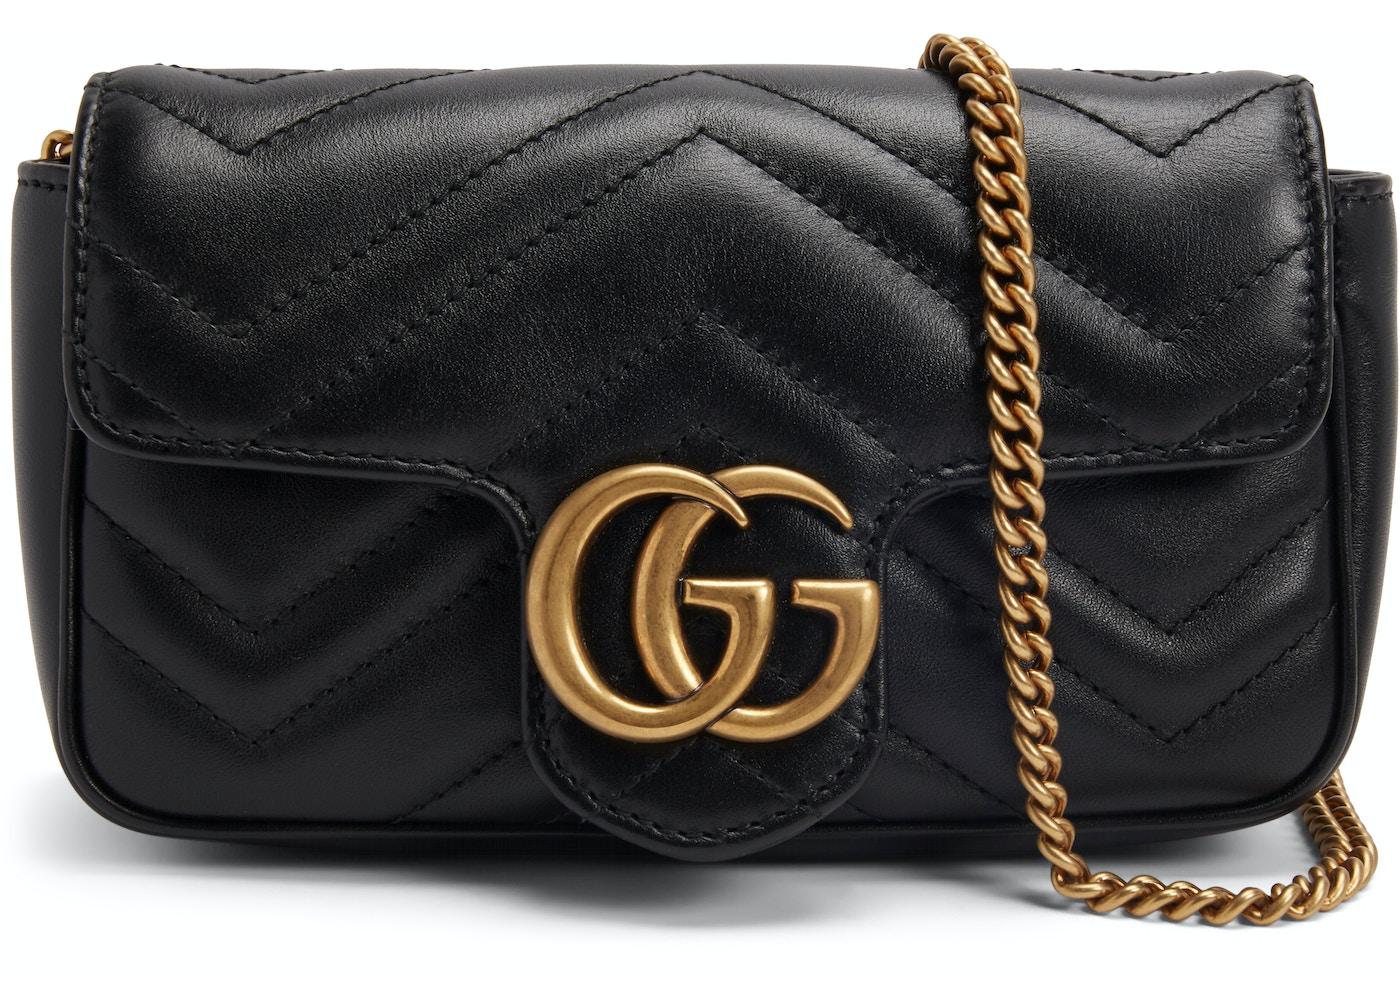 681e18508 Buy & Sell Gucci Luxury Handbags